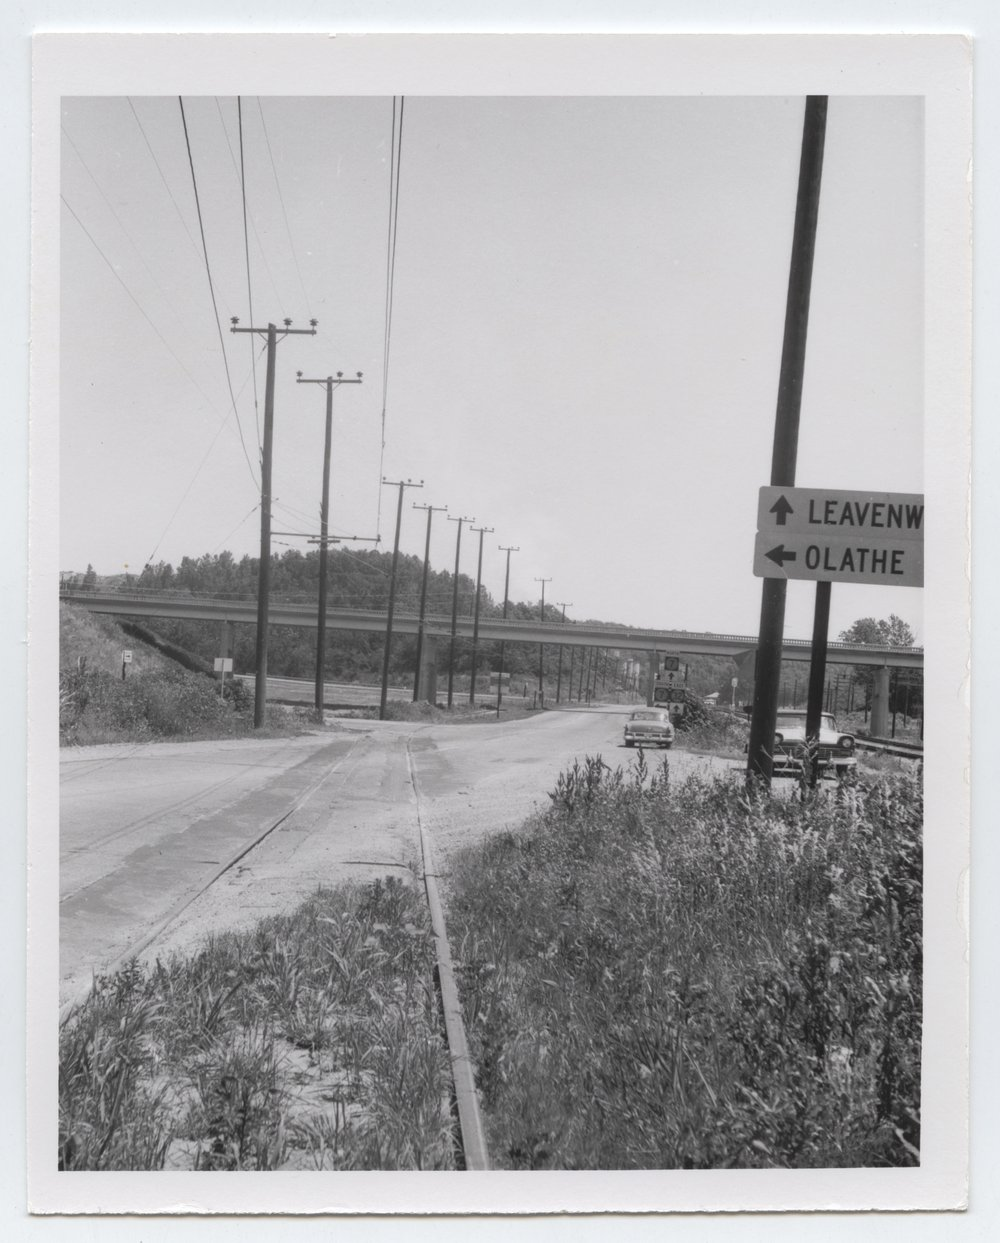 Kansas City, Kaw Valley K-32 crossing, Bonner Springs, Kansas - 1